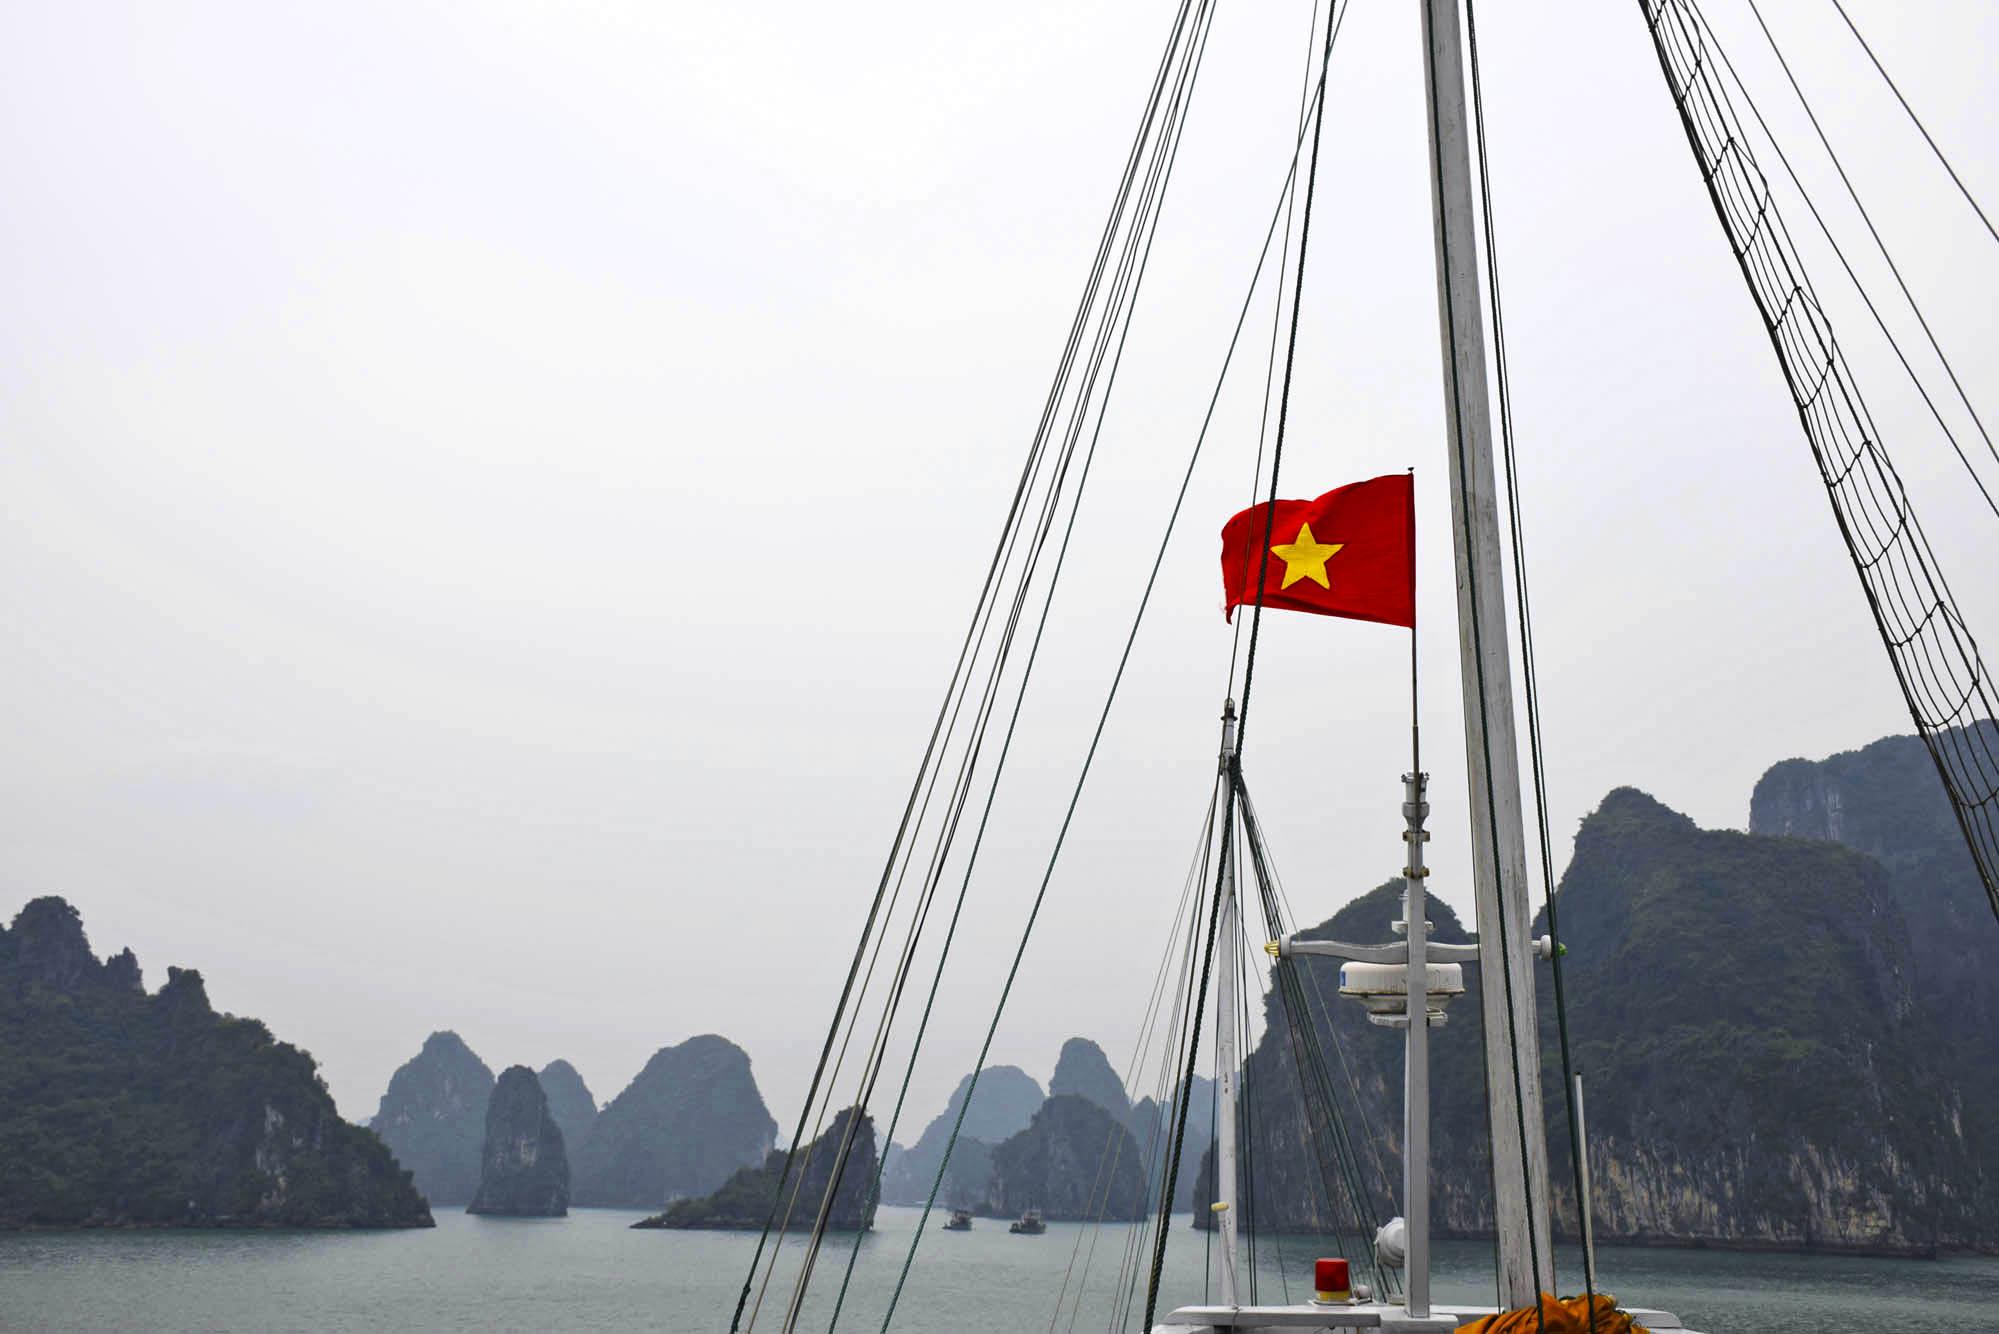 halong-bay-vietna-dicas-barco-paradise-luxury-cruise-2